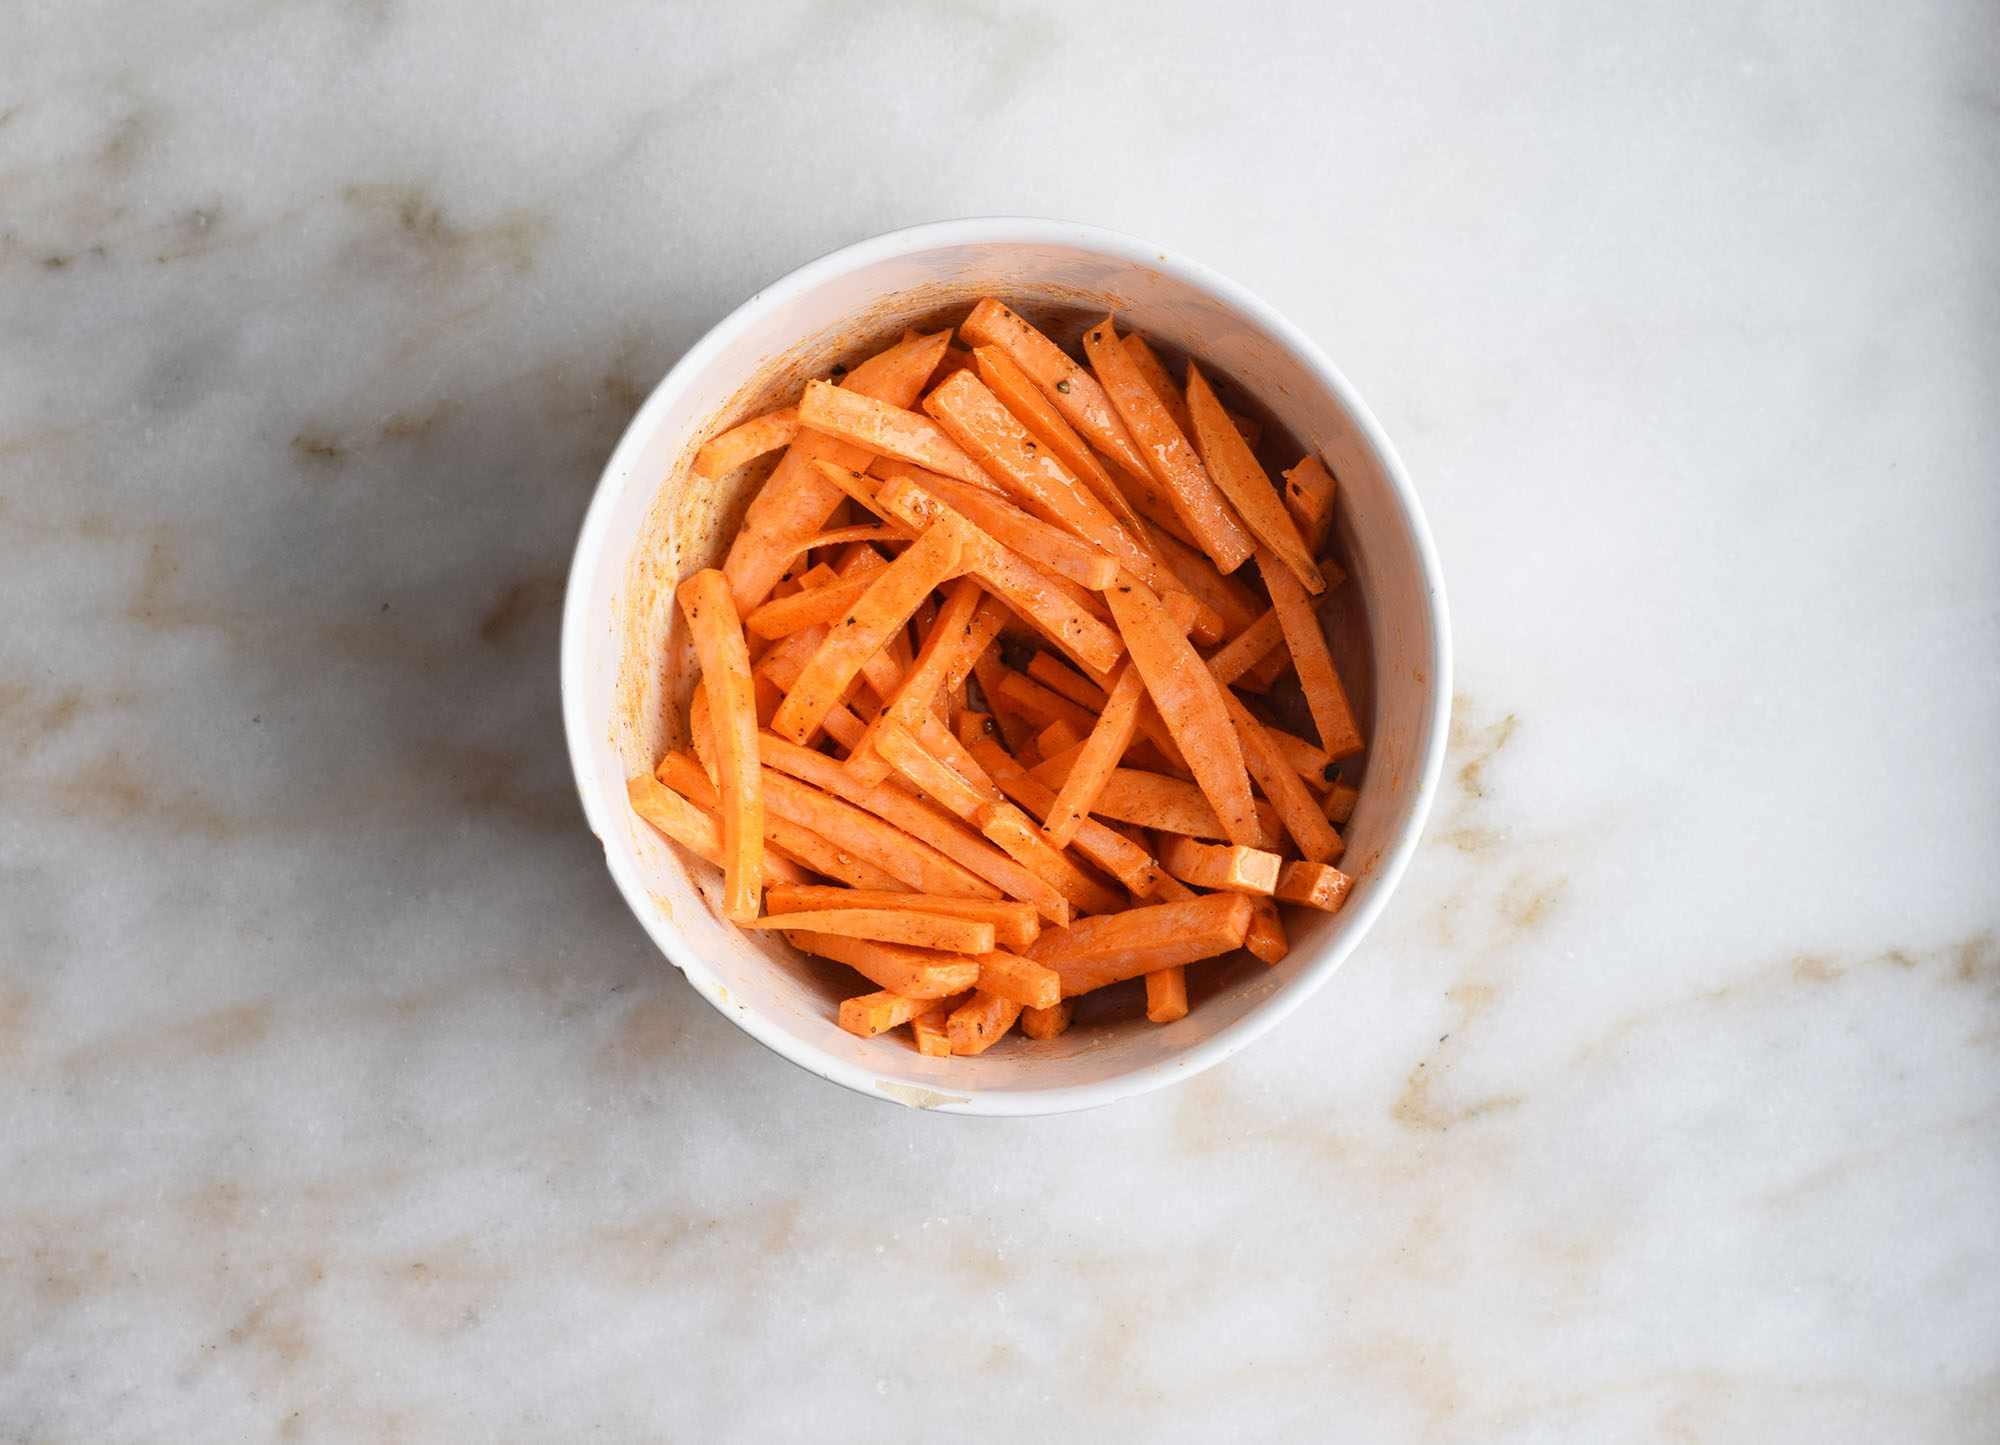 Sweet potato fries coated in oil and seasonings